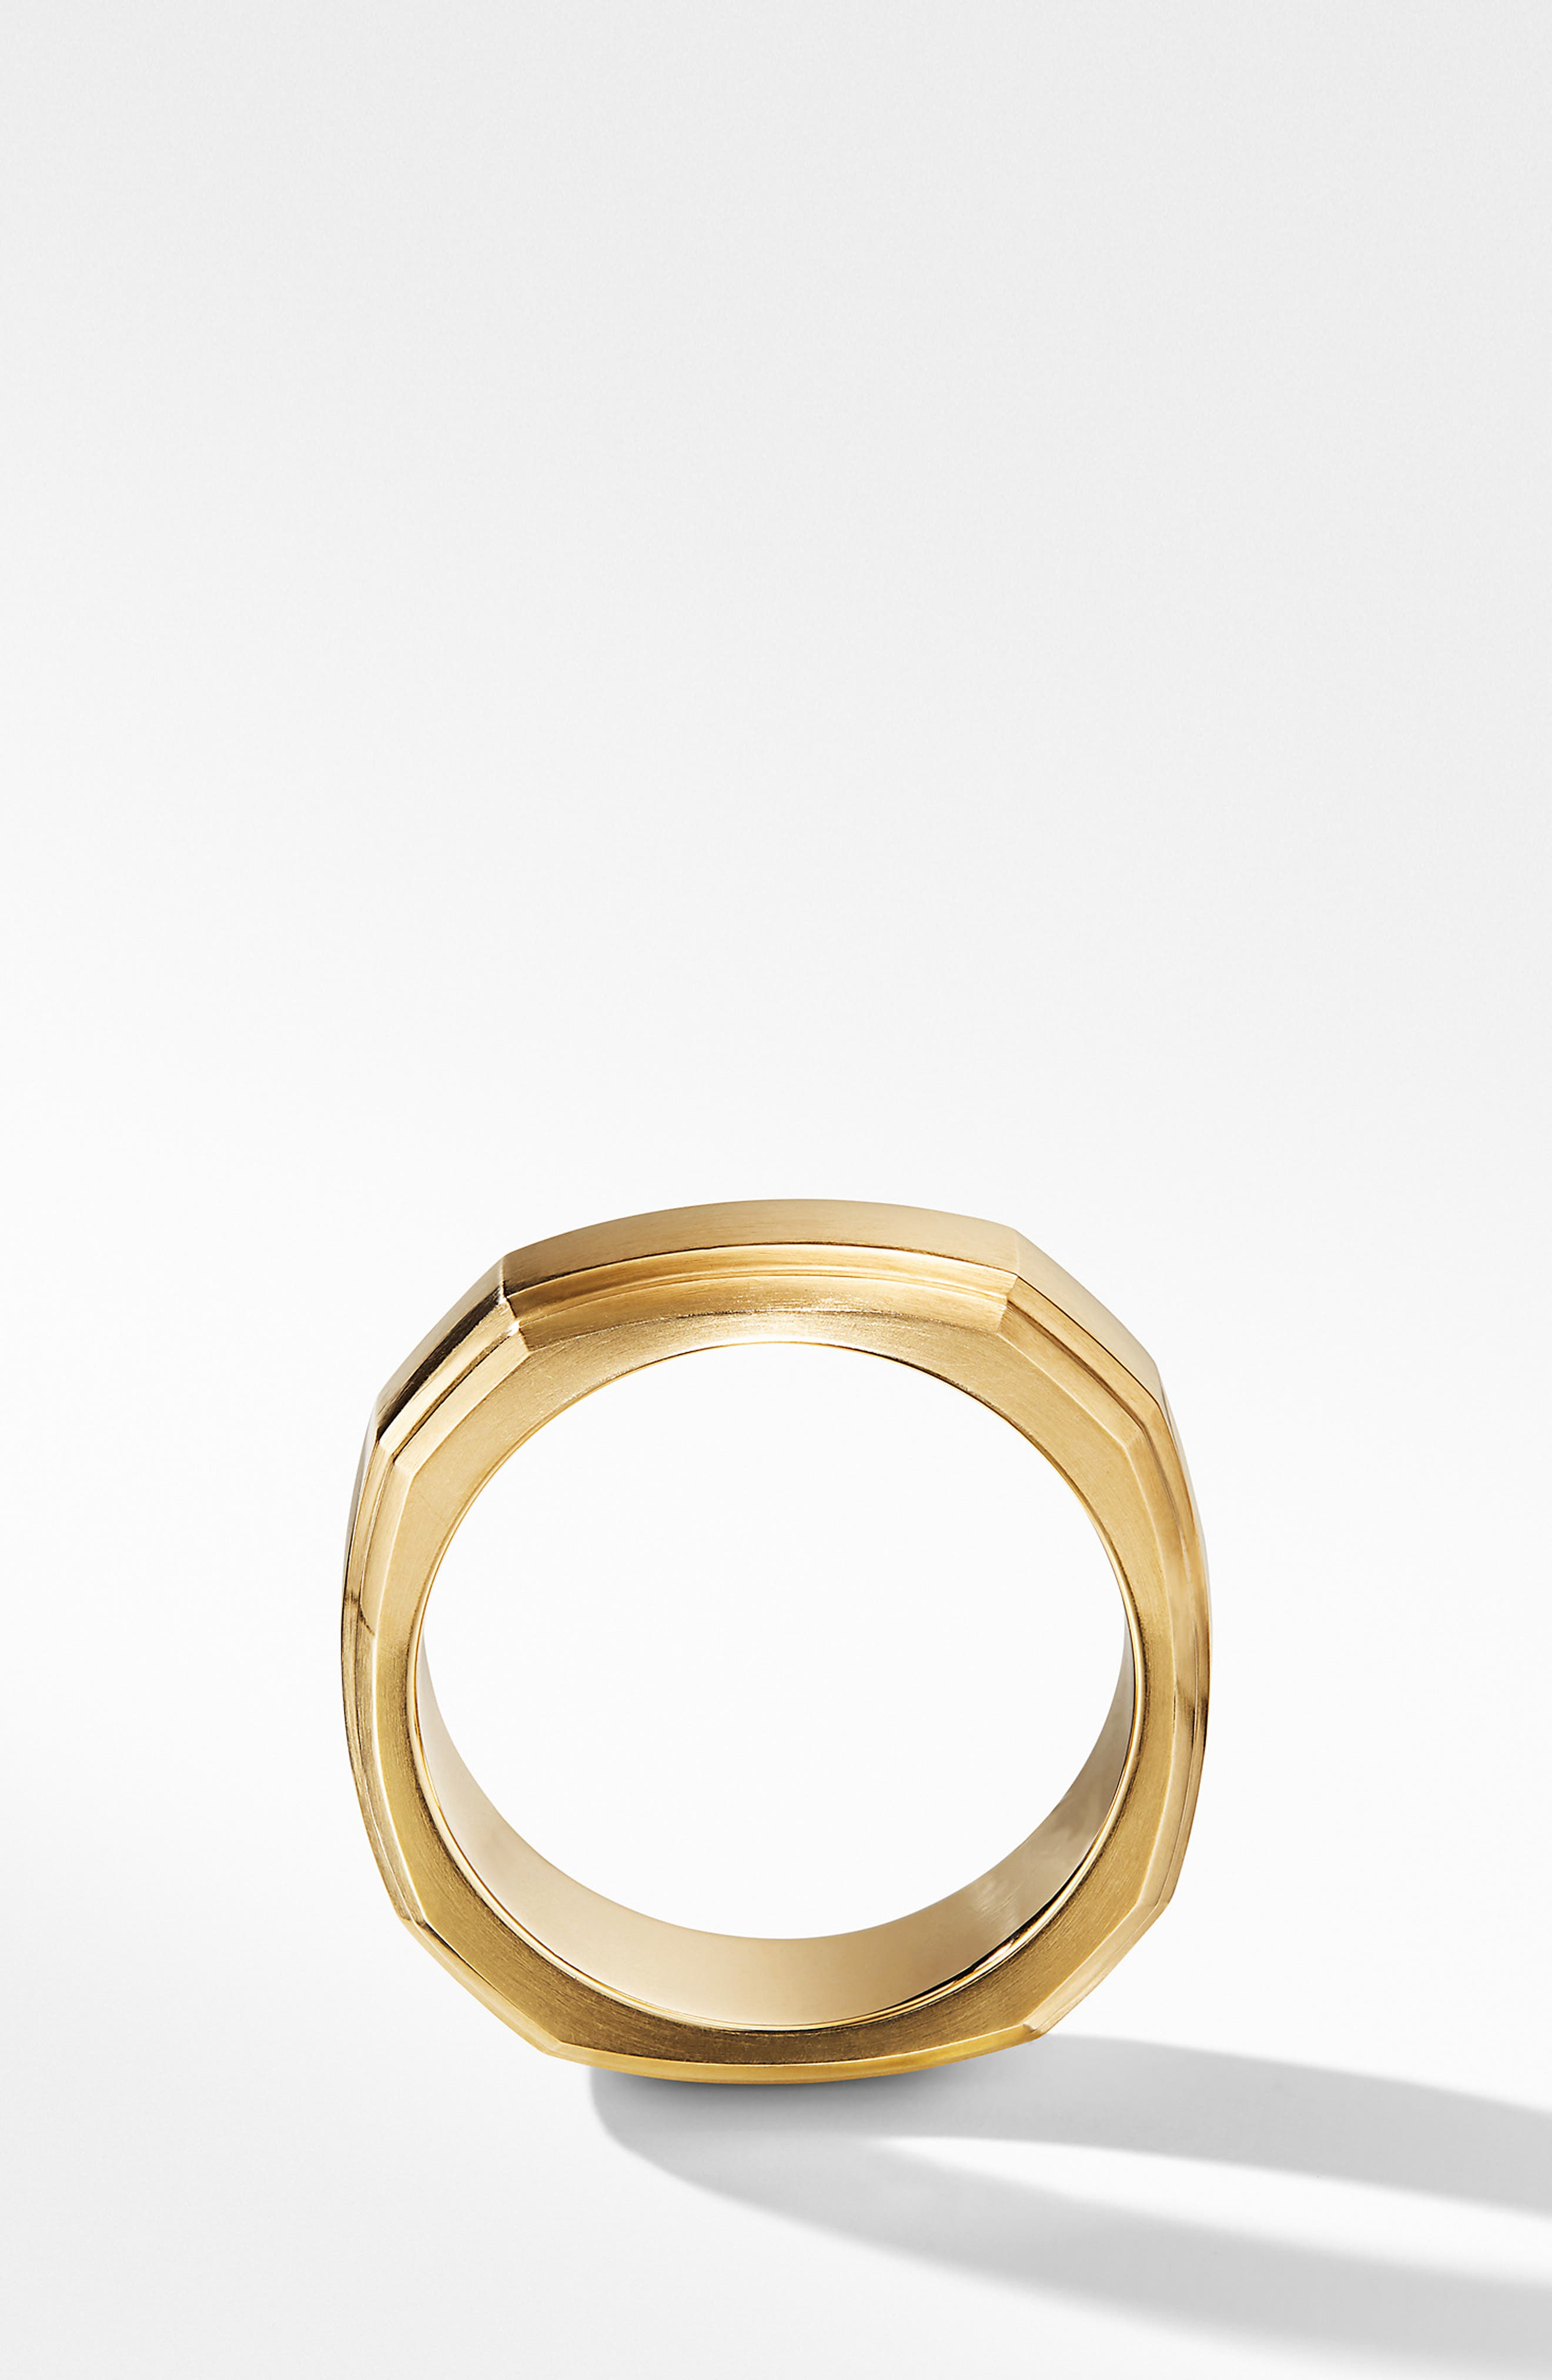 18K Gold Deco Band Ring,                             Alternate thumbnail 2, color,                             GOLD